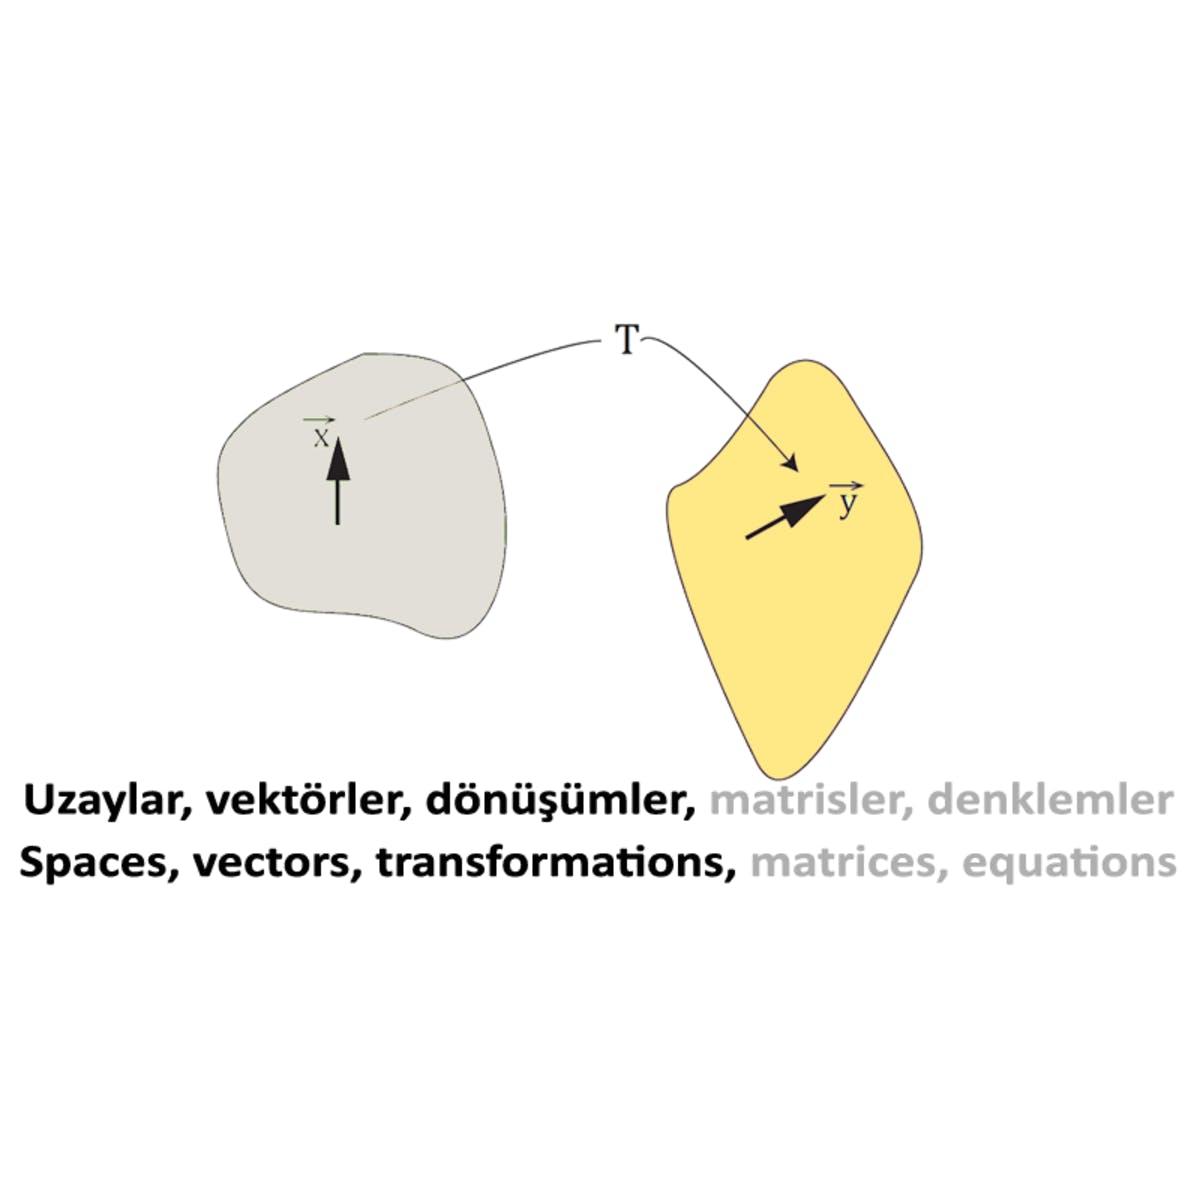 Doğrusal Cebir I: Uzaylar ve İşlemciler / Linear Algebra I: Spaces and Operators